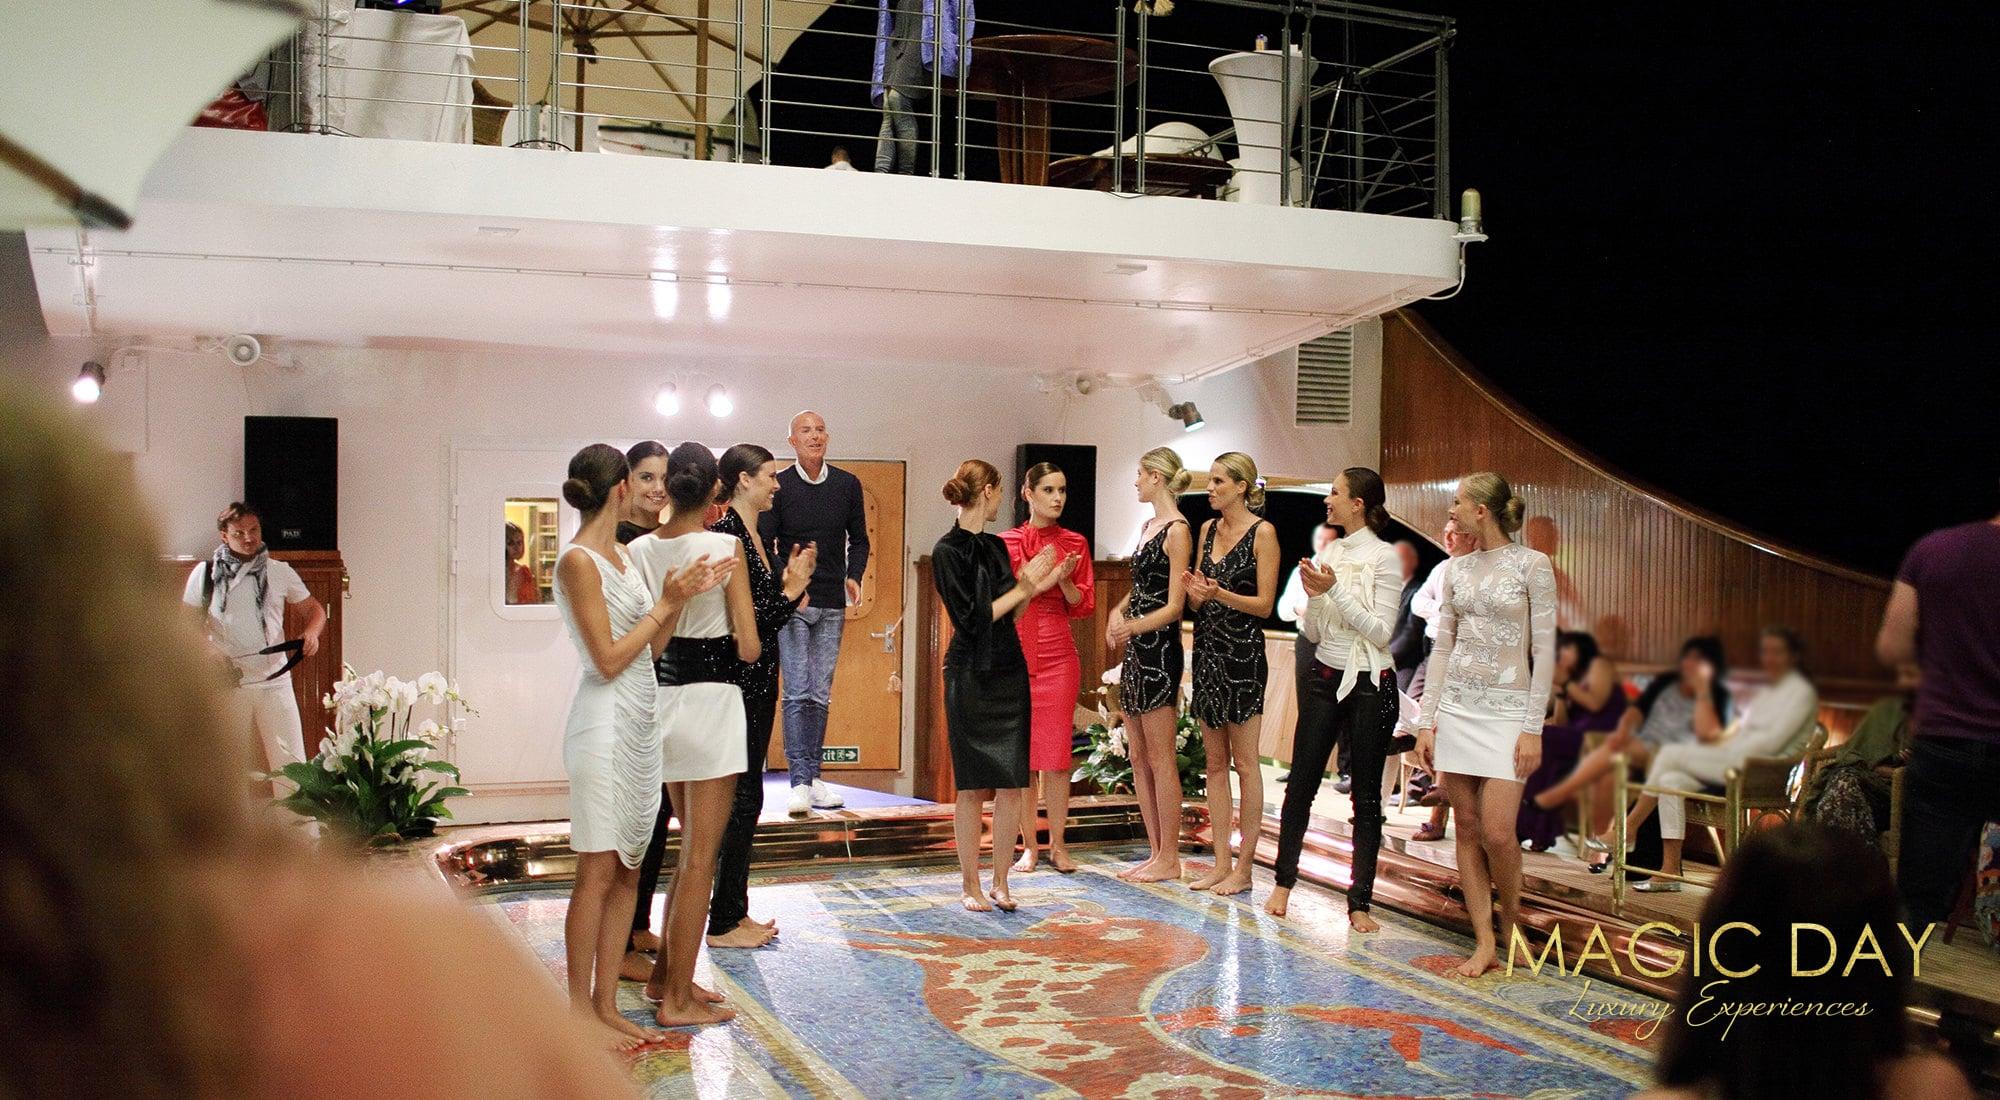 Jean-Claude Jitrois fashion show aboard Christina O mega yacht